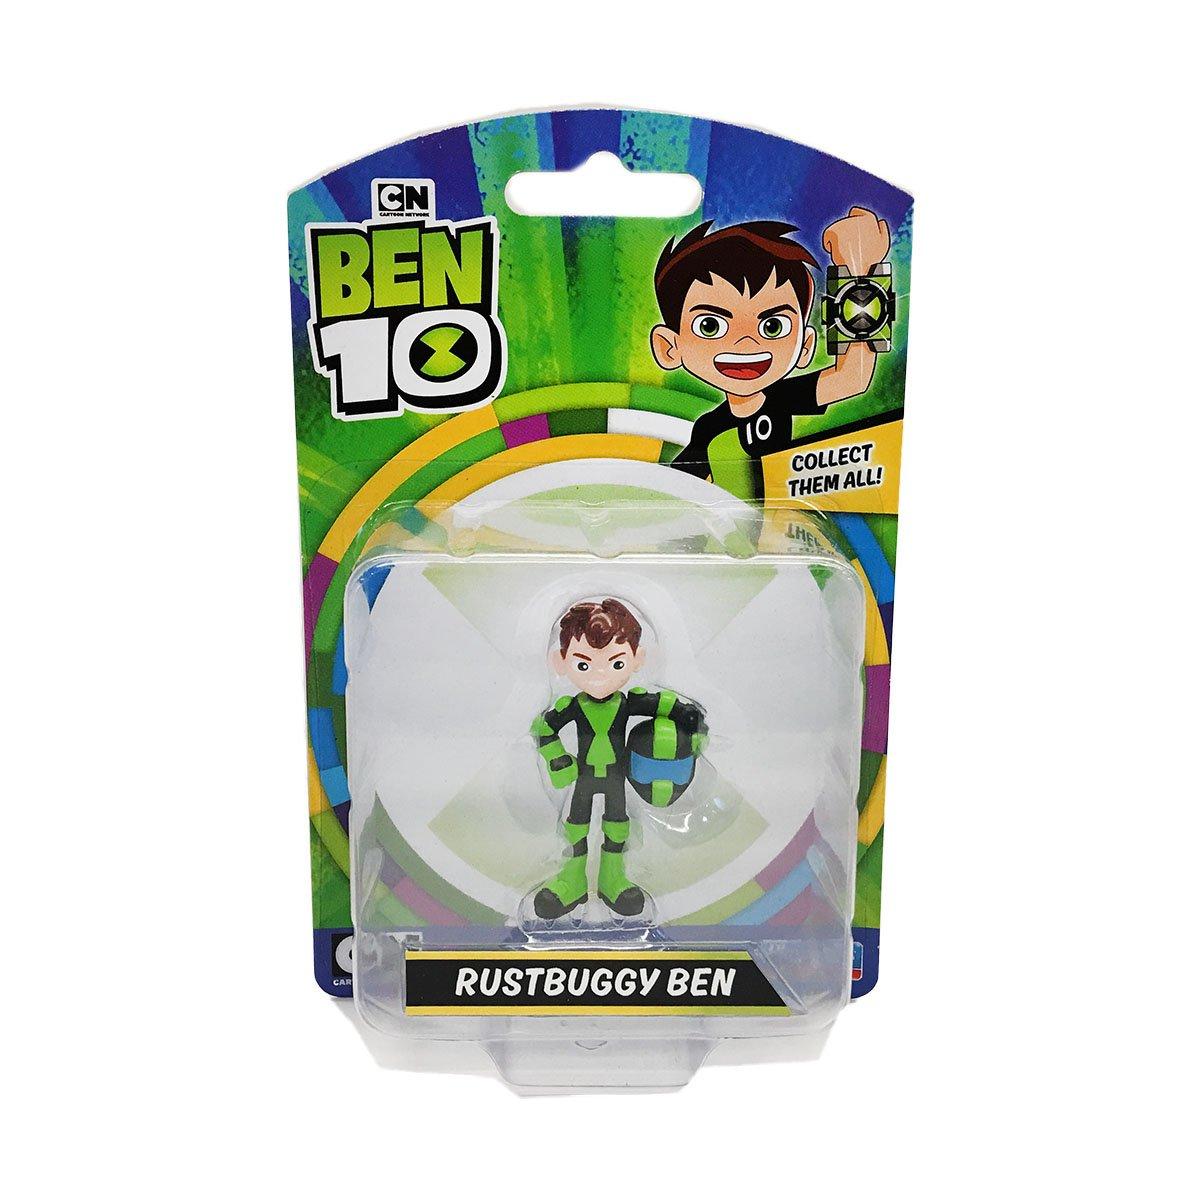 Minifigurina Ben 10, Rustbuggy Ben, 76774